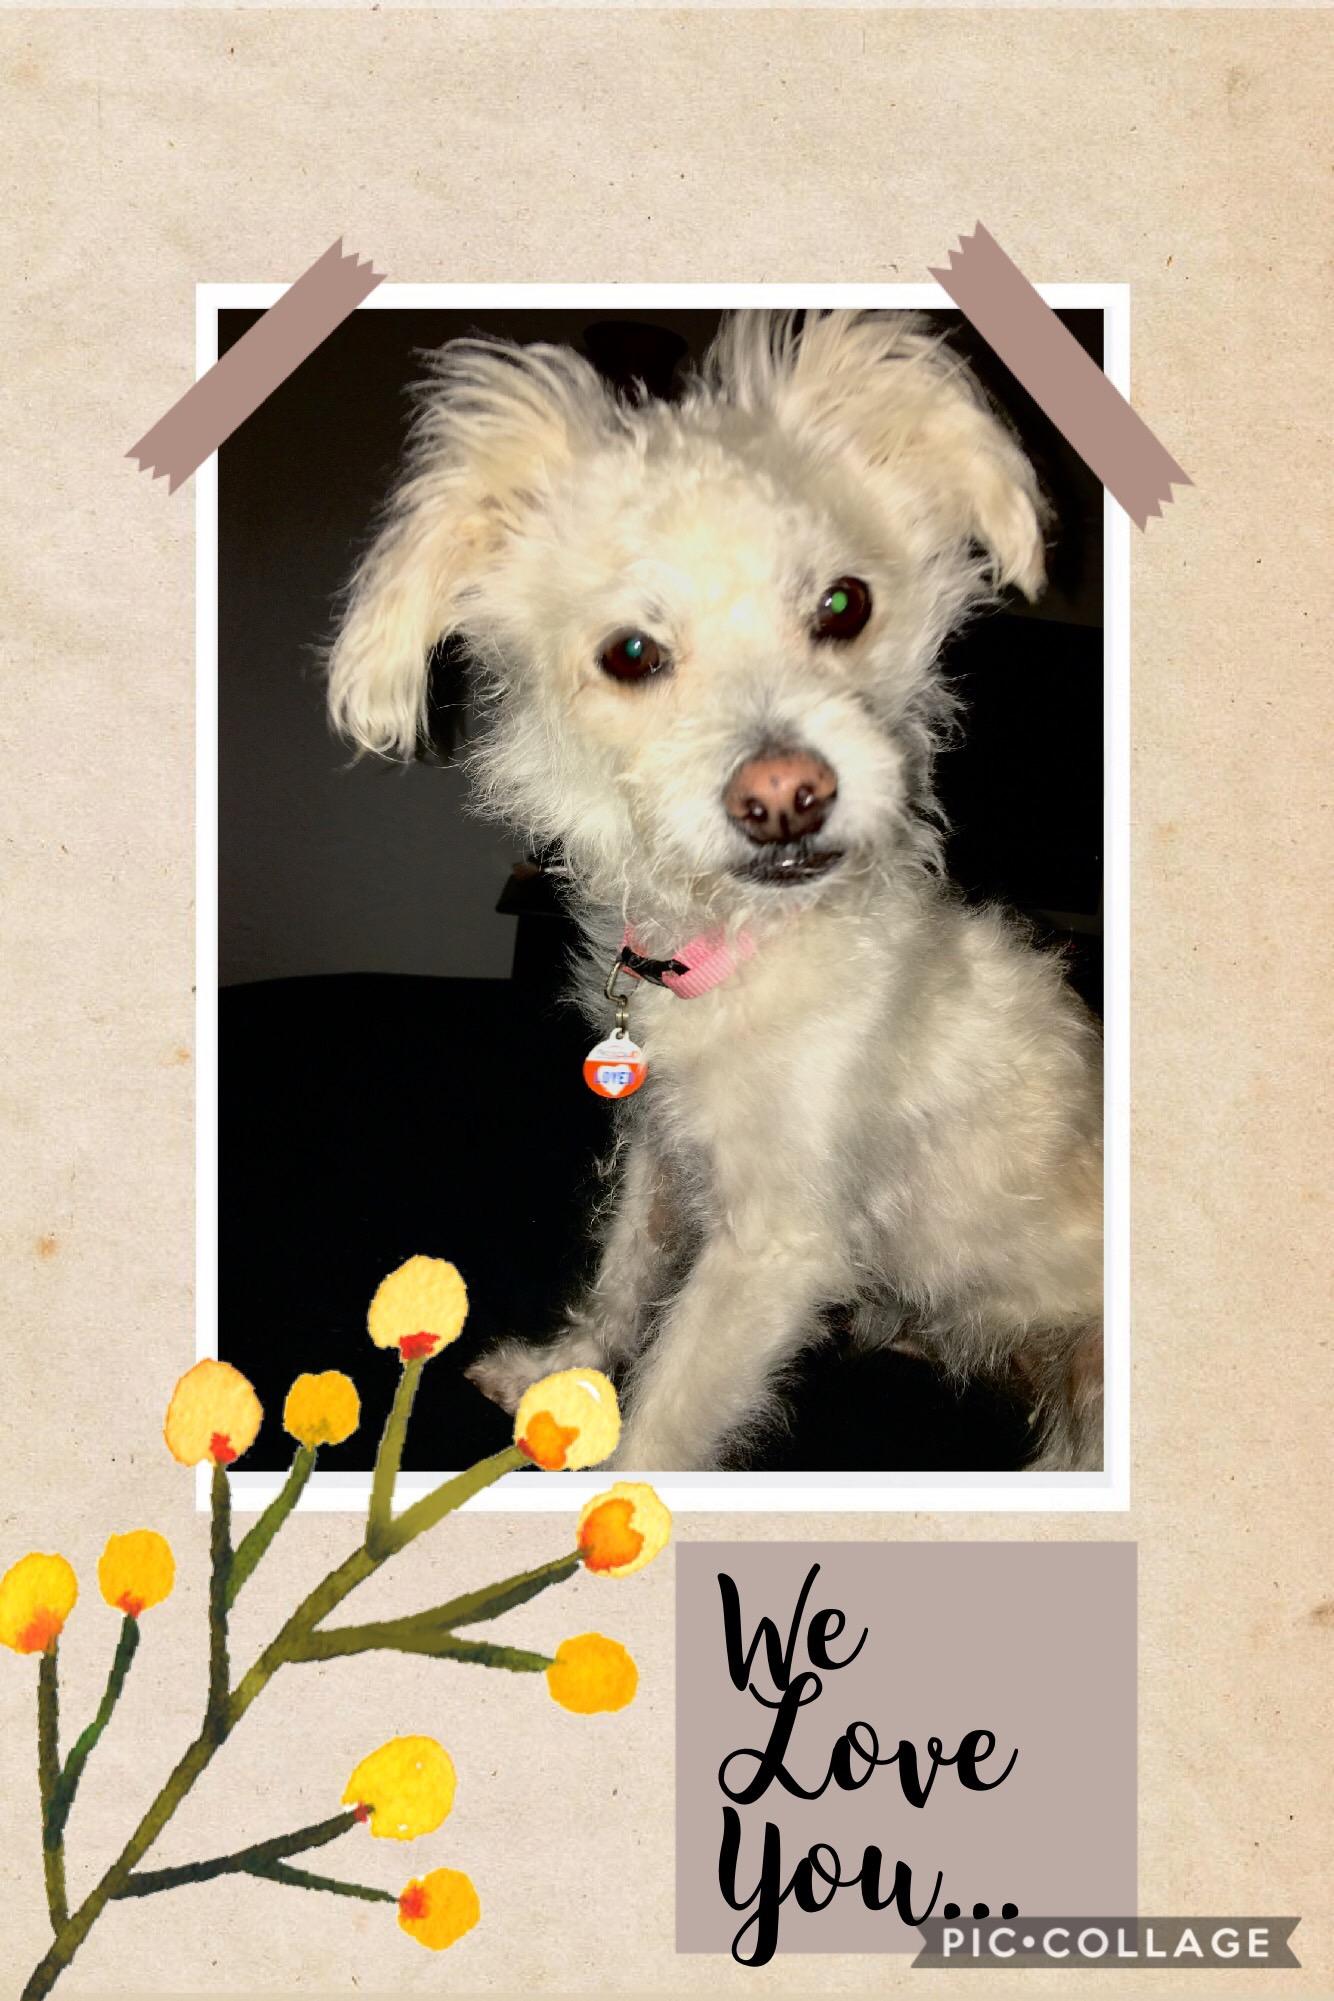 Lucy dog cancer 2018 NHV tumor free cutest dog